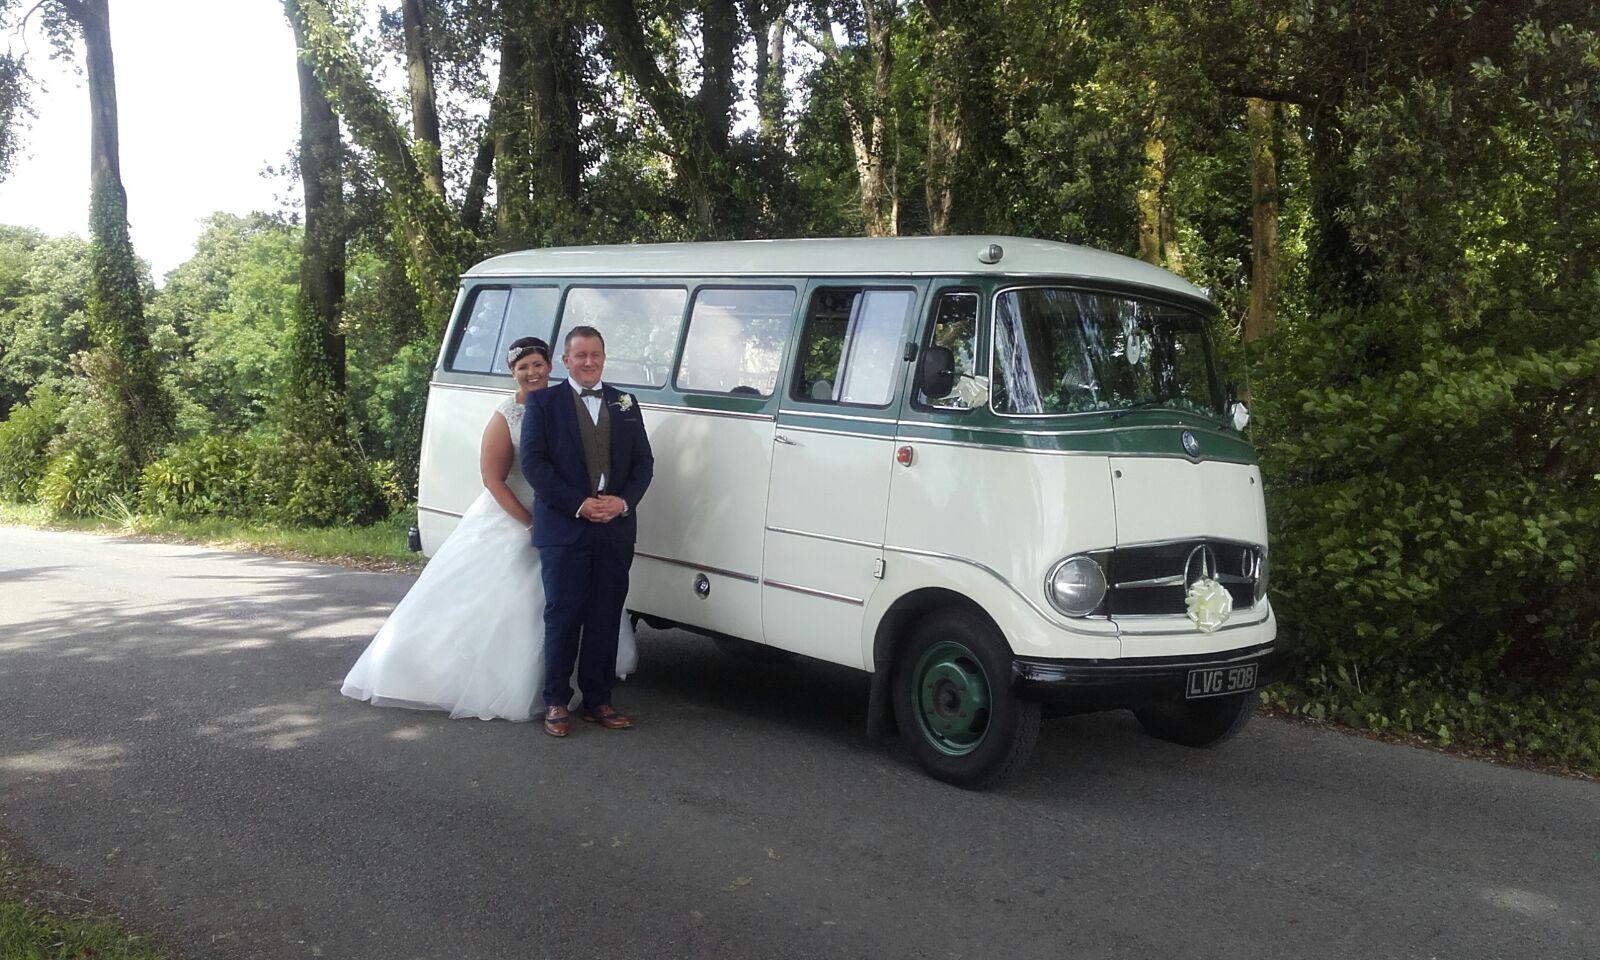 Betsy Wedding Car Hire